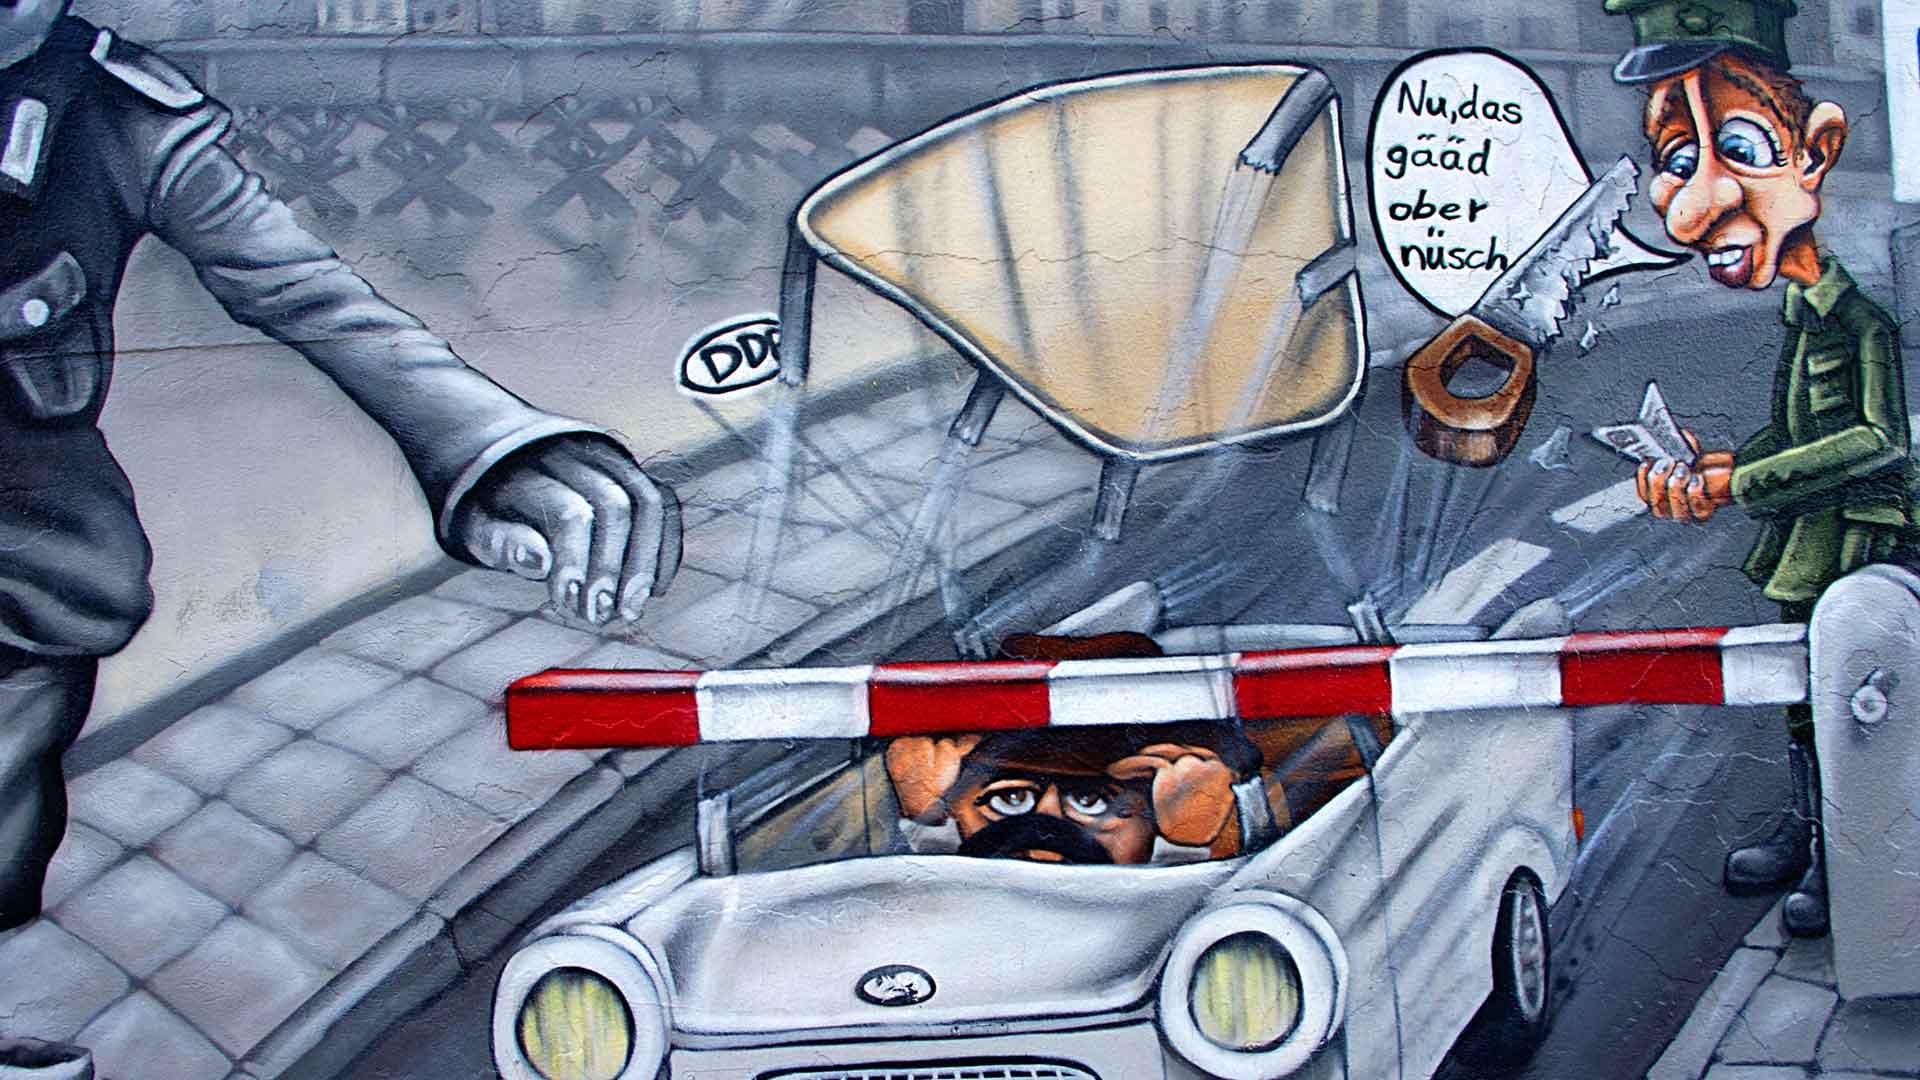 Graffiti bij Checkpoint Charlie in Berlijn.